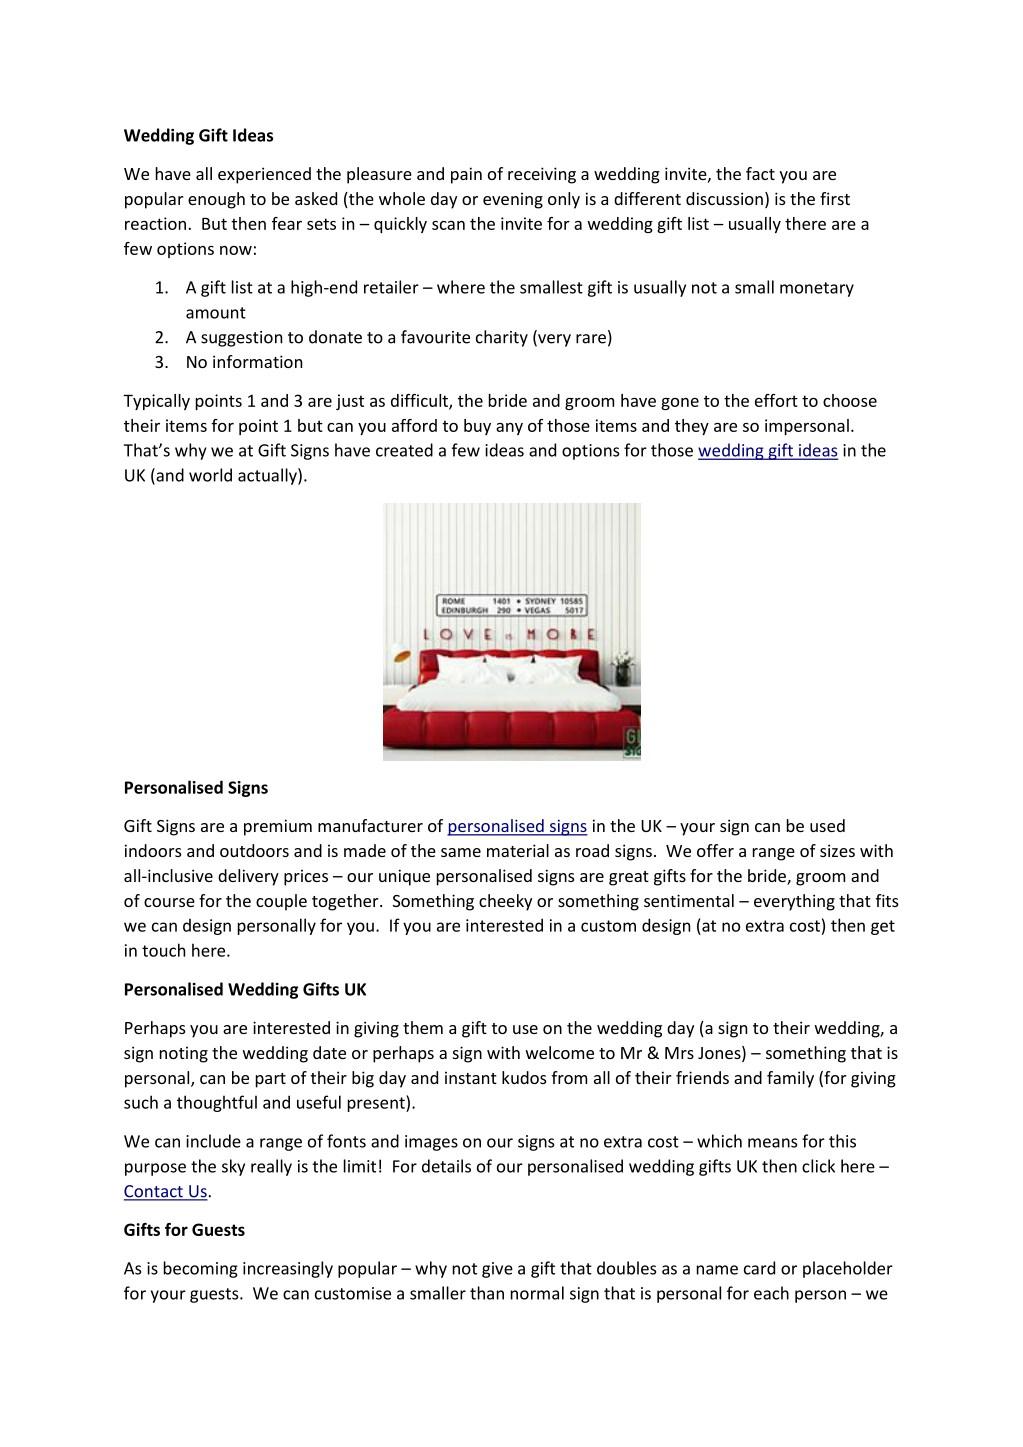 ppt wedding gift ideas powerpoint presentation id 7856807